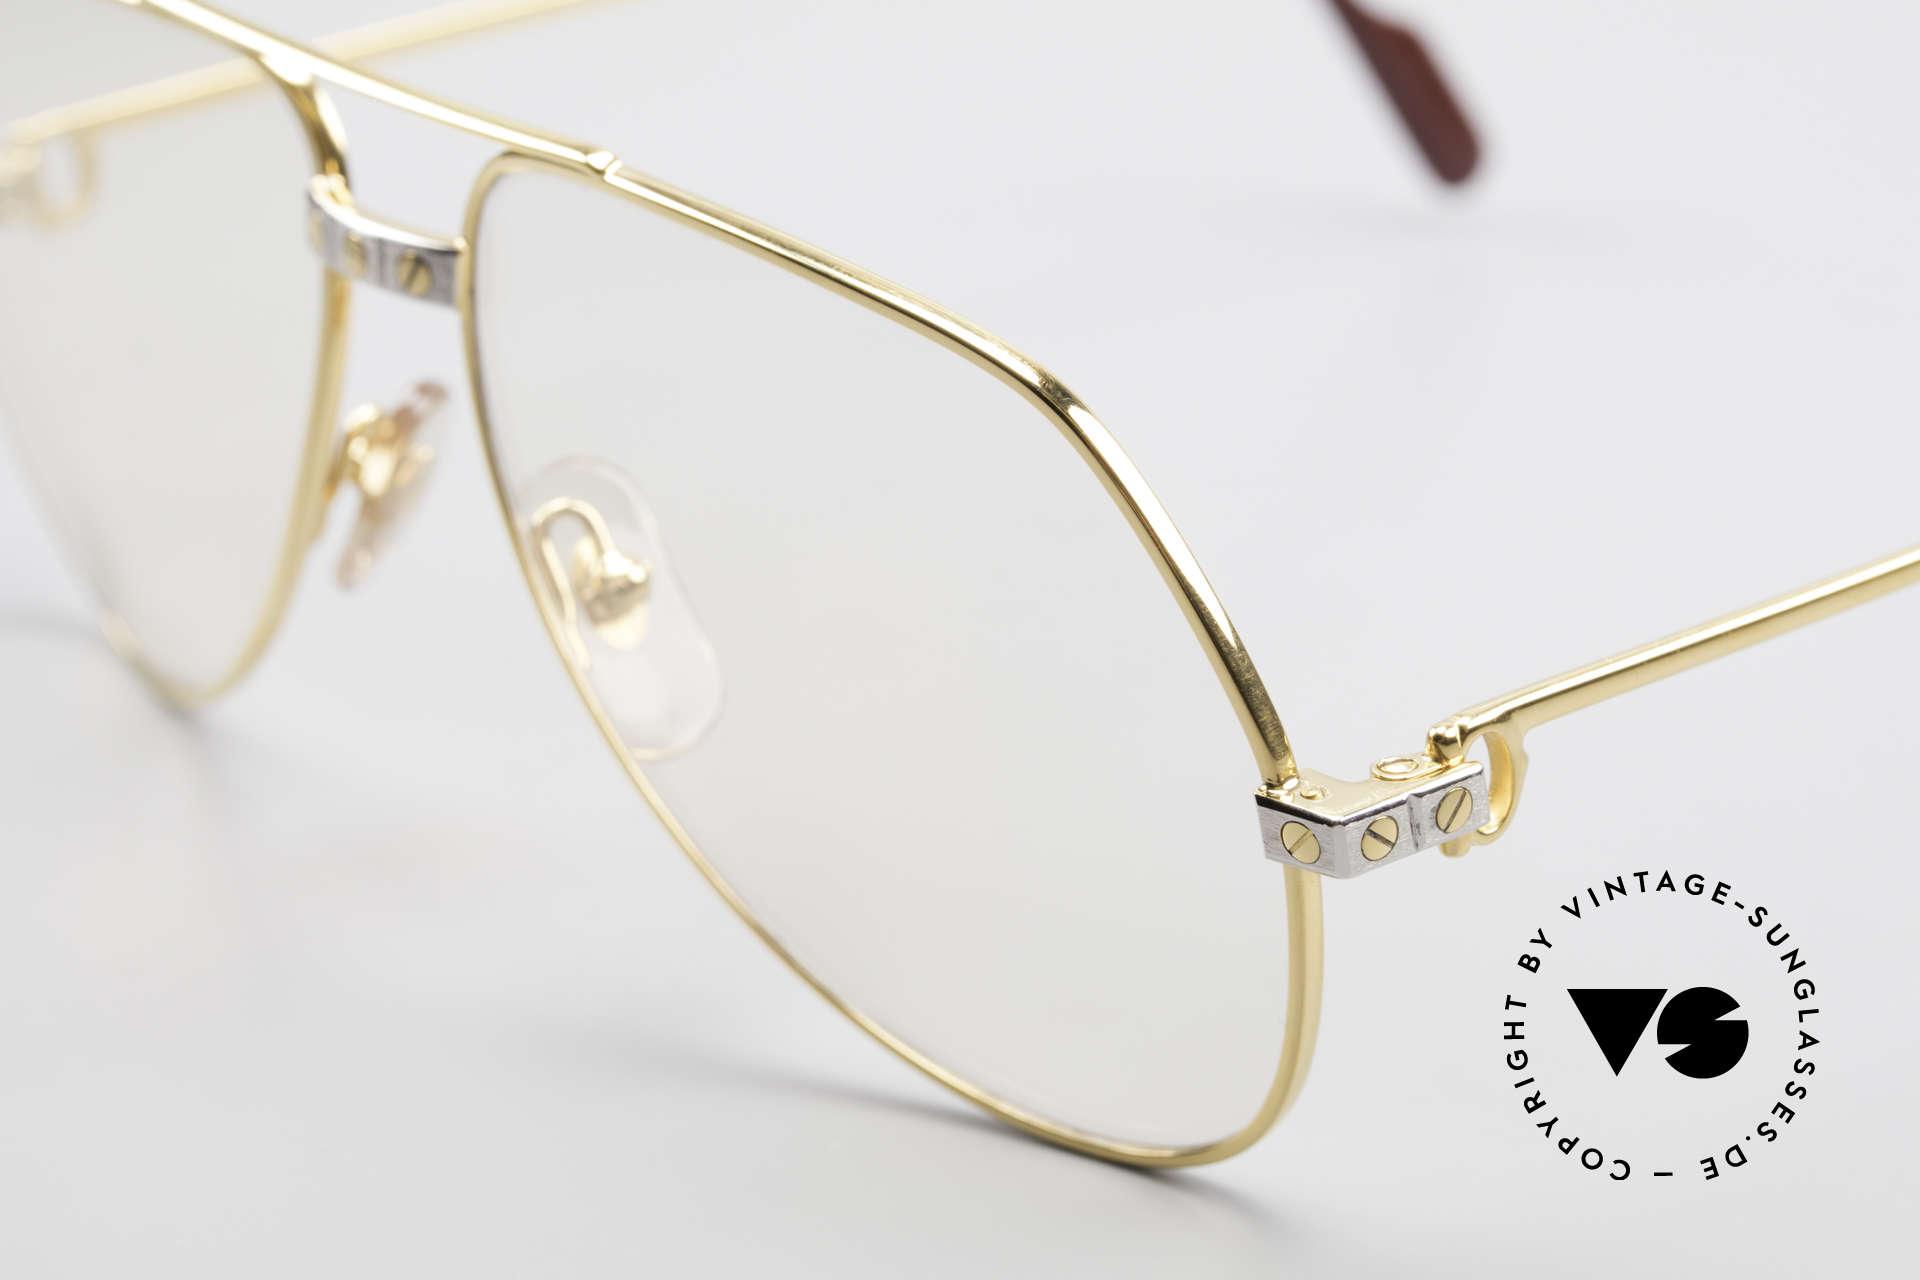 Cartier Vendome Santos - M Automatik Cartier Gläser, teure Mineralgläser verdunkeln bei Sonne automatisch!, Passend für Herren